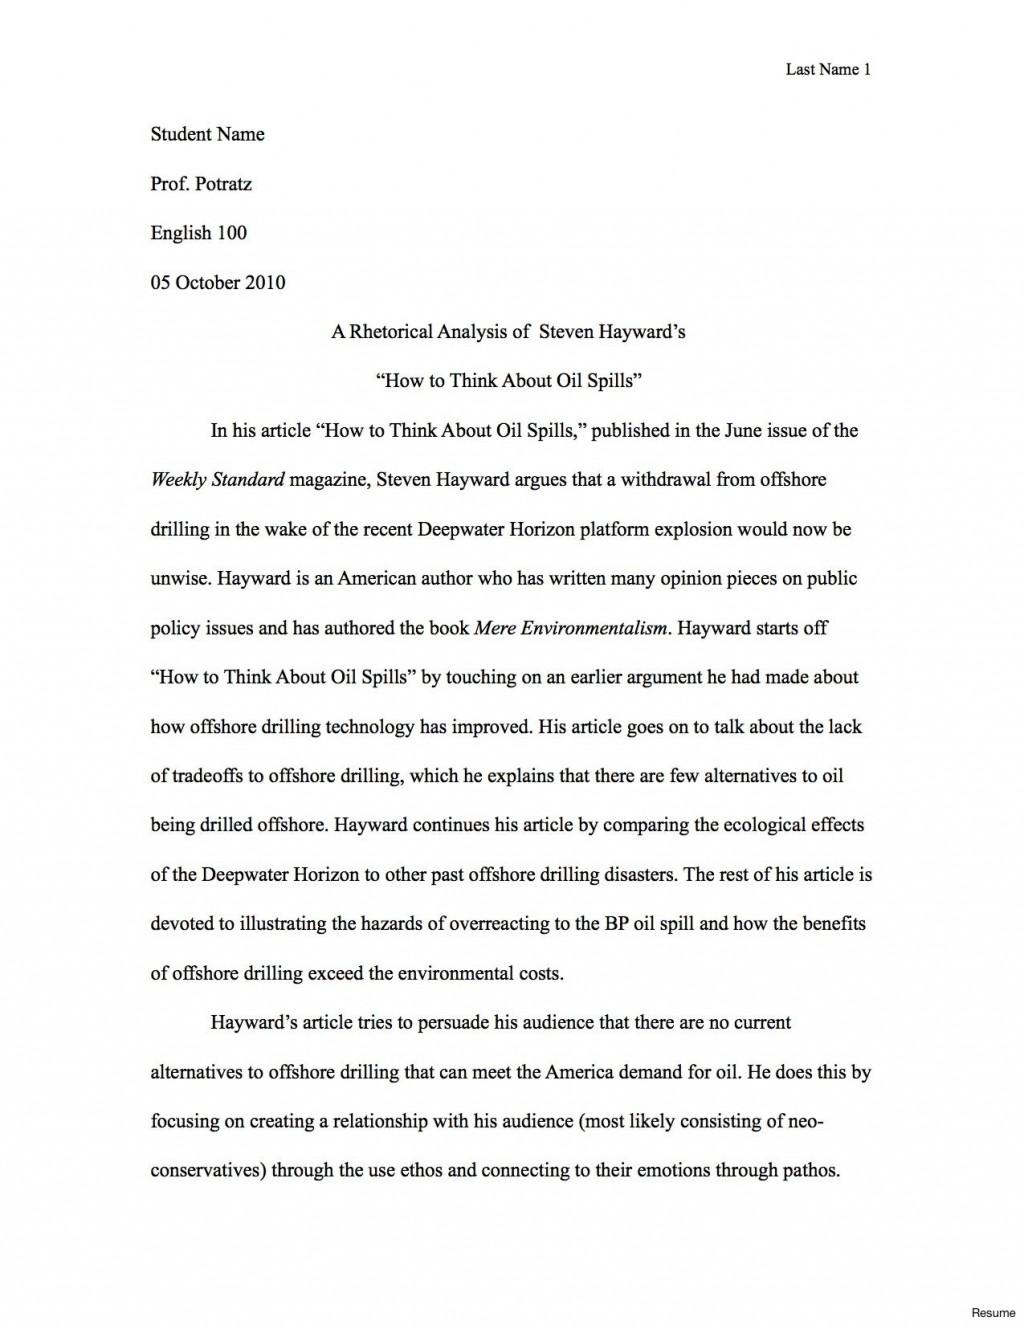 004 Rhetorical Essay Examples Visual Analysis Example Sample Jpg Argument Unusual Ap Lang Strategies Large